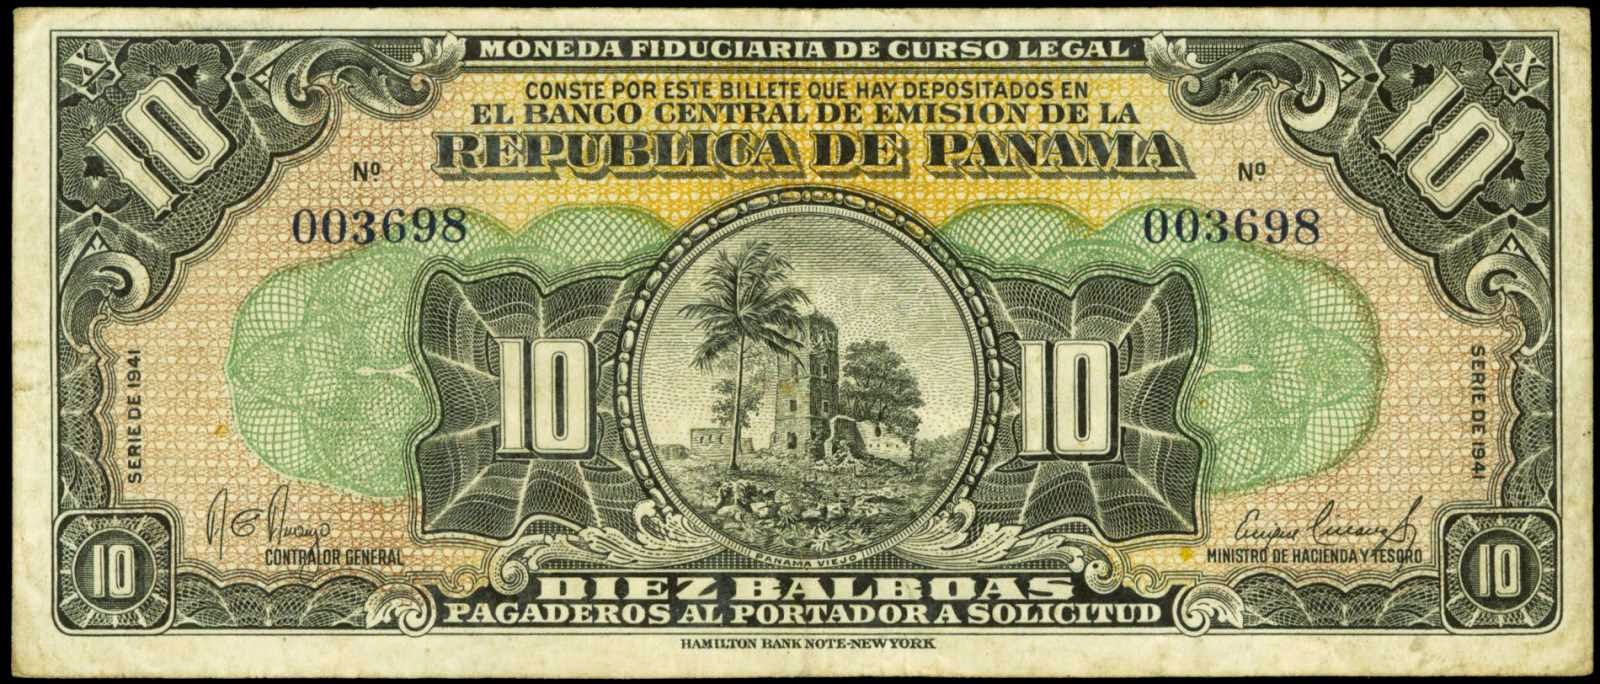 Panama banknotes paper money 10 Balboas note 1941